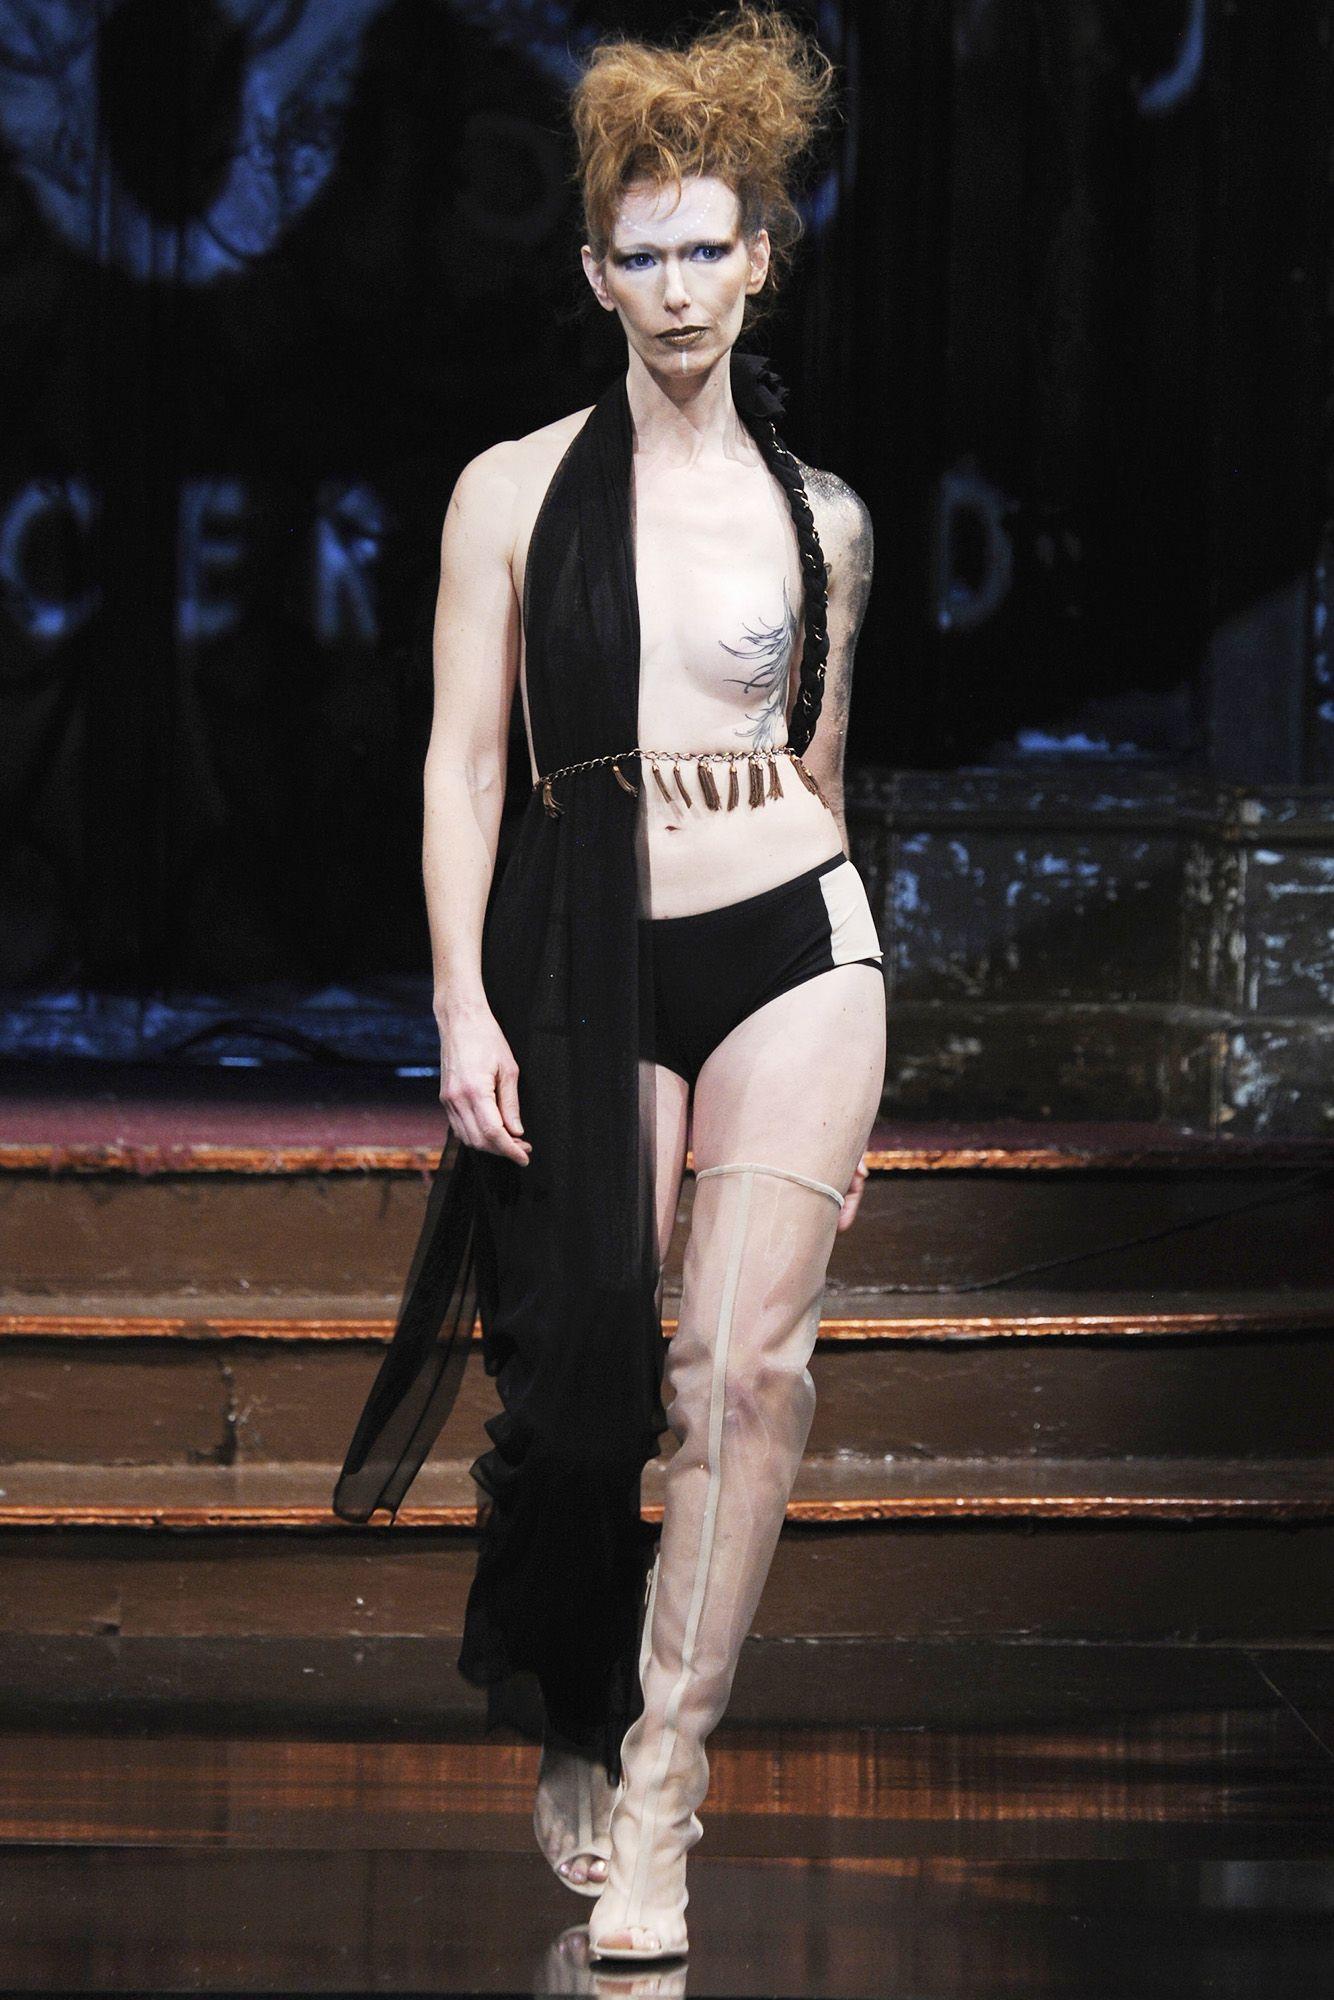 Topless fashion show